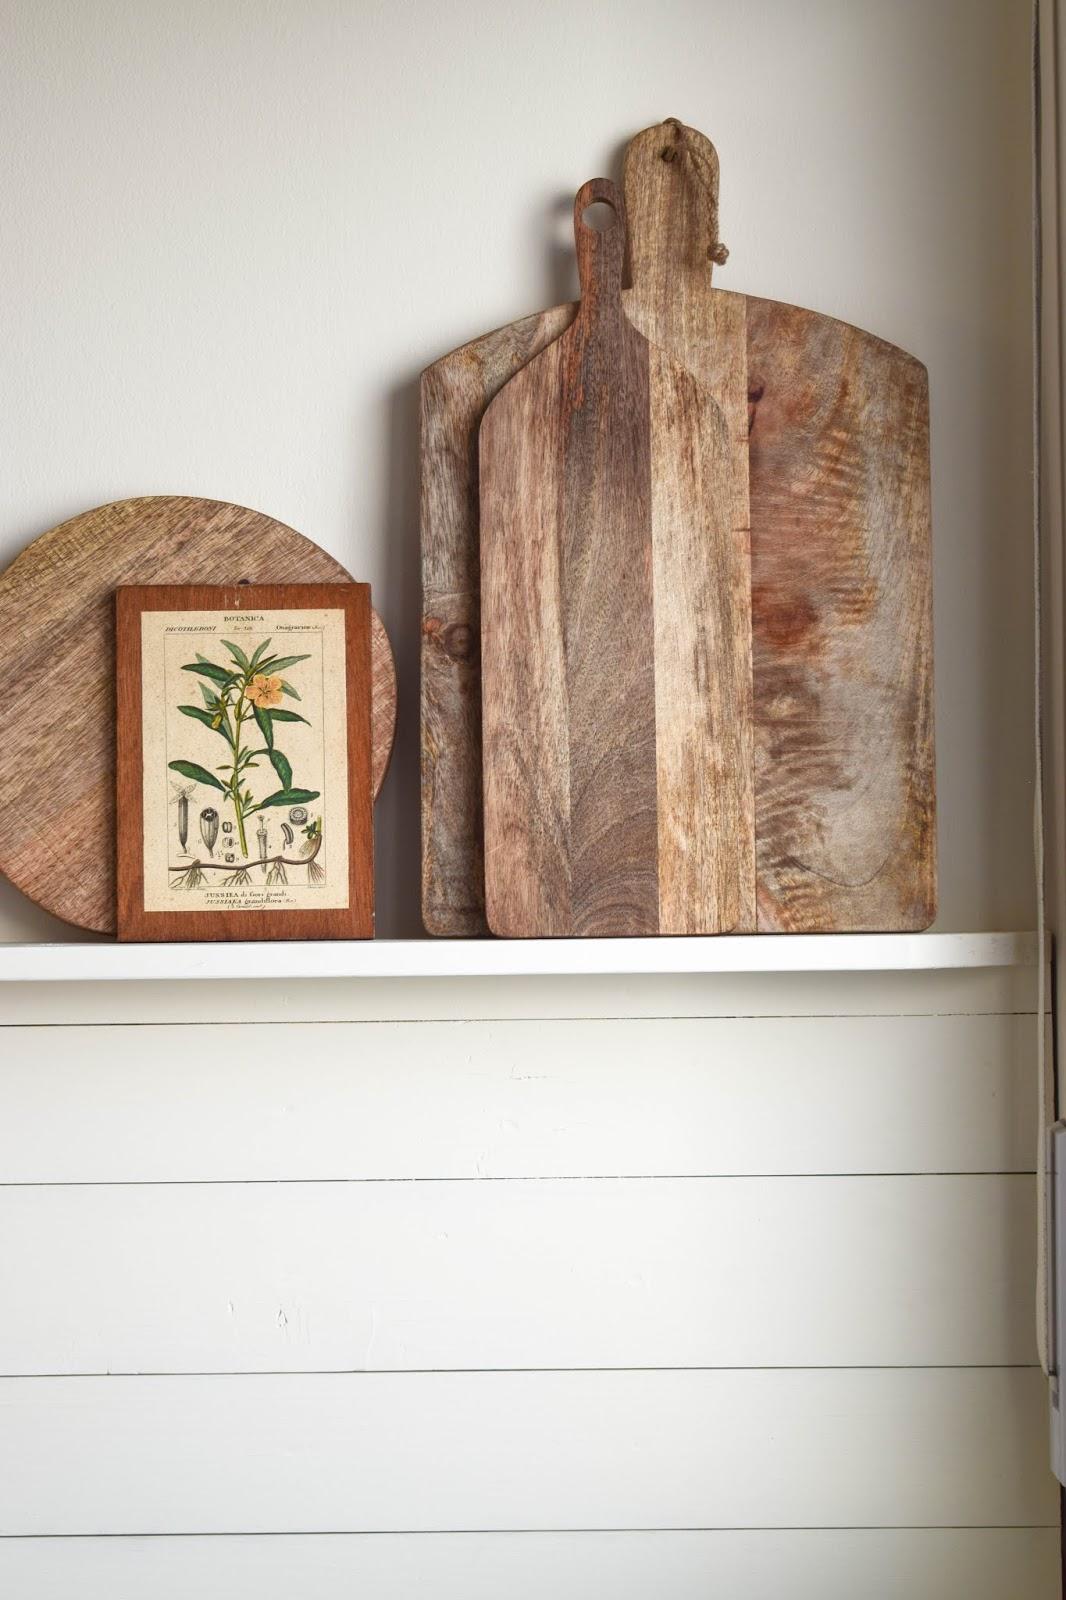 DIY Wandverkleidung Holz selbermachen Holzvertäfelung Holzverkleidung Wandegal Renovierung Küche Landhaus Country Kitchen Regal